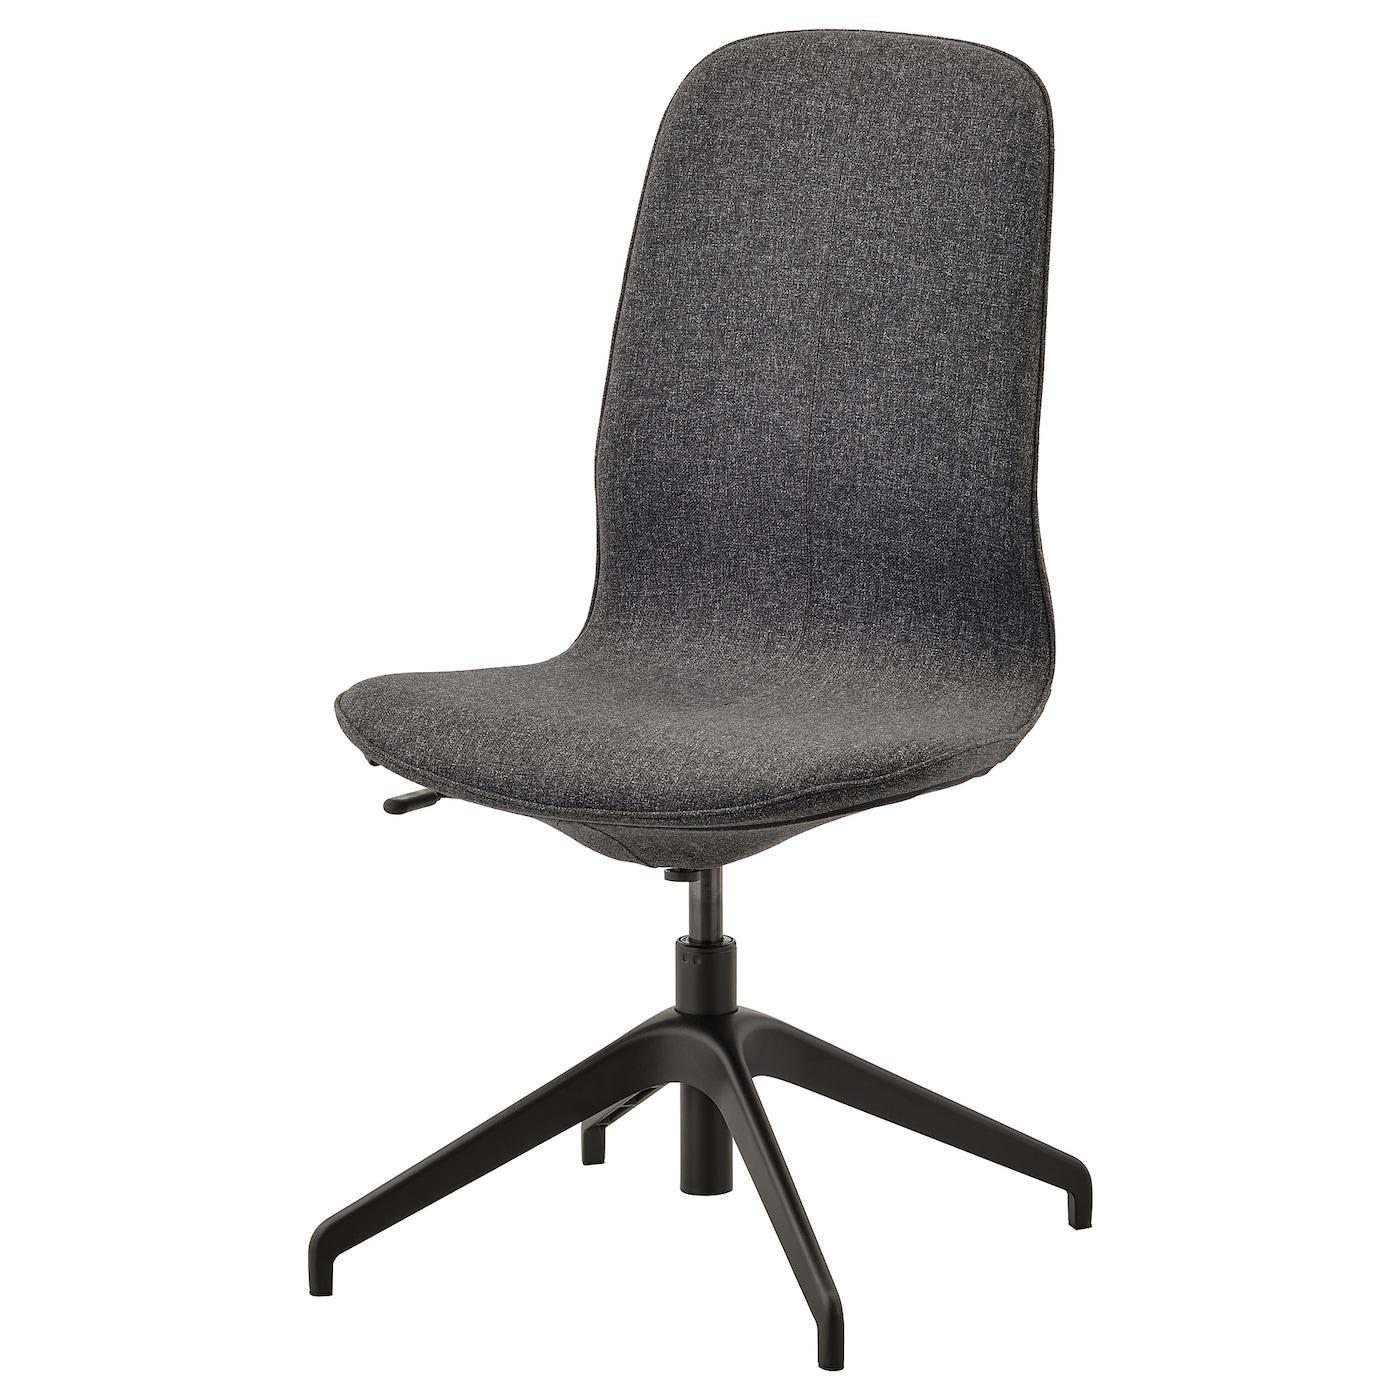 IKEA LÅNGFJÄLL Konferenzstuhl Gunnared dunkelgrau, schwarz Gunnared dunkelgrau | Büro > Bürostühle und Sessel  > Konferenzstühle | IKEA